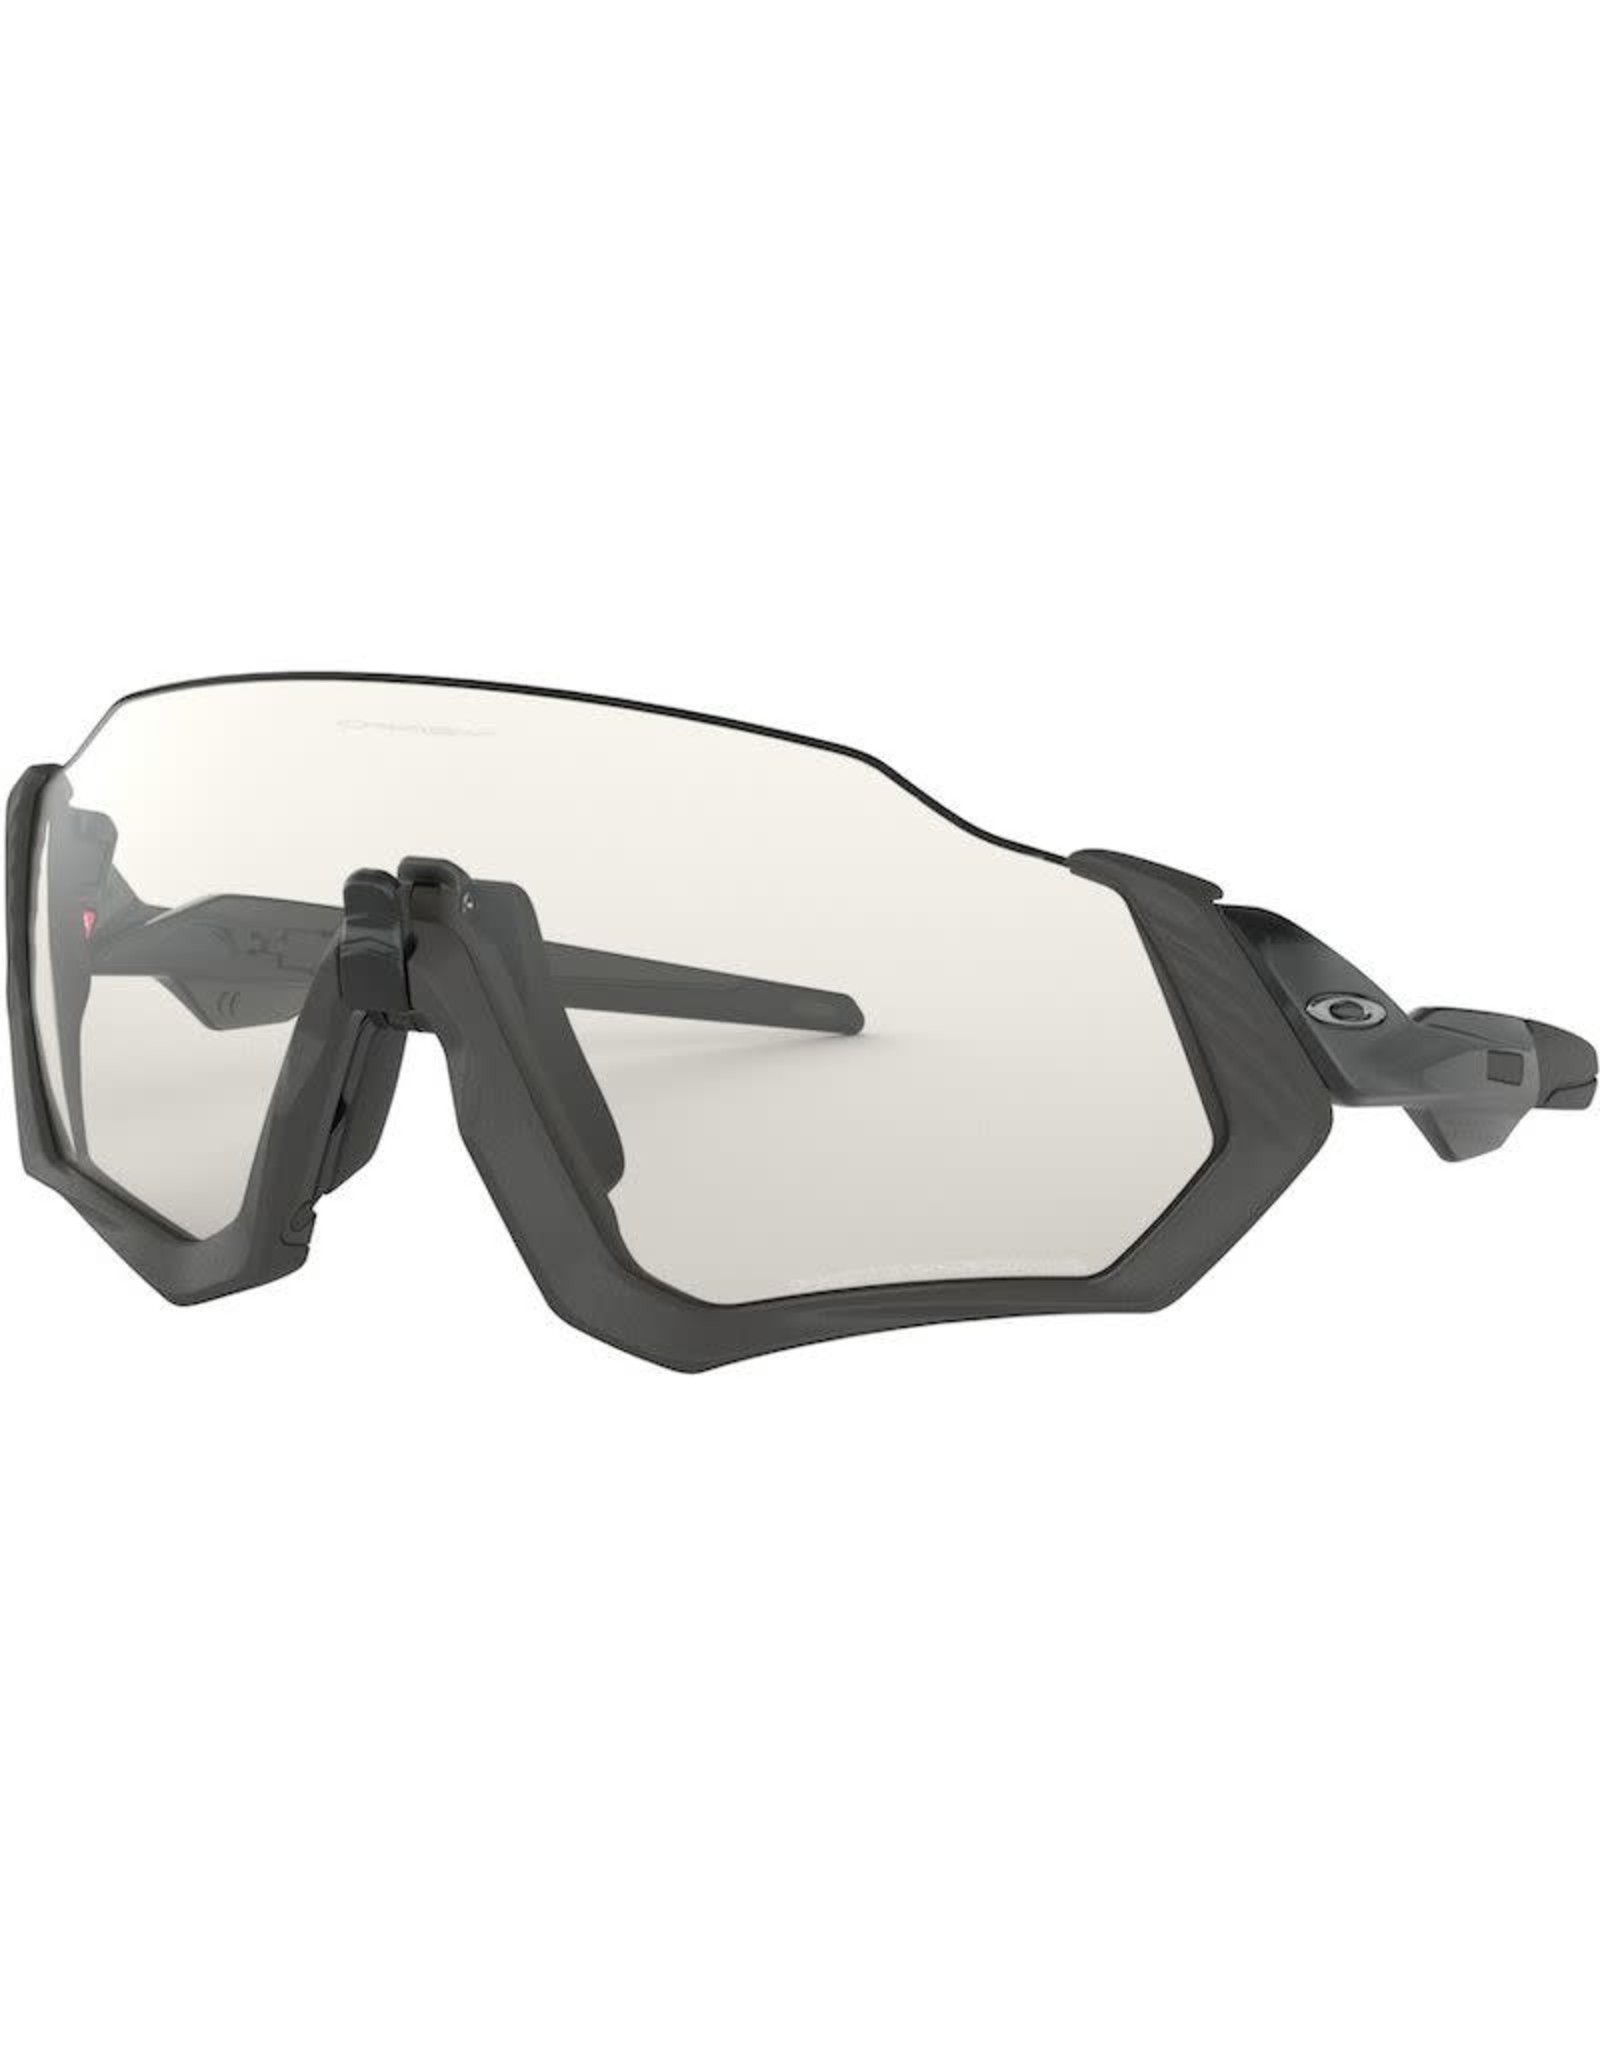 Oakley Oakley Flight Jacket Scenic Grey Clear Black Iridium Photocromatic